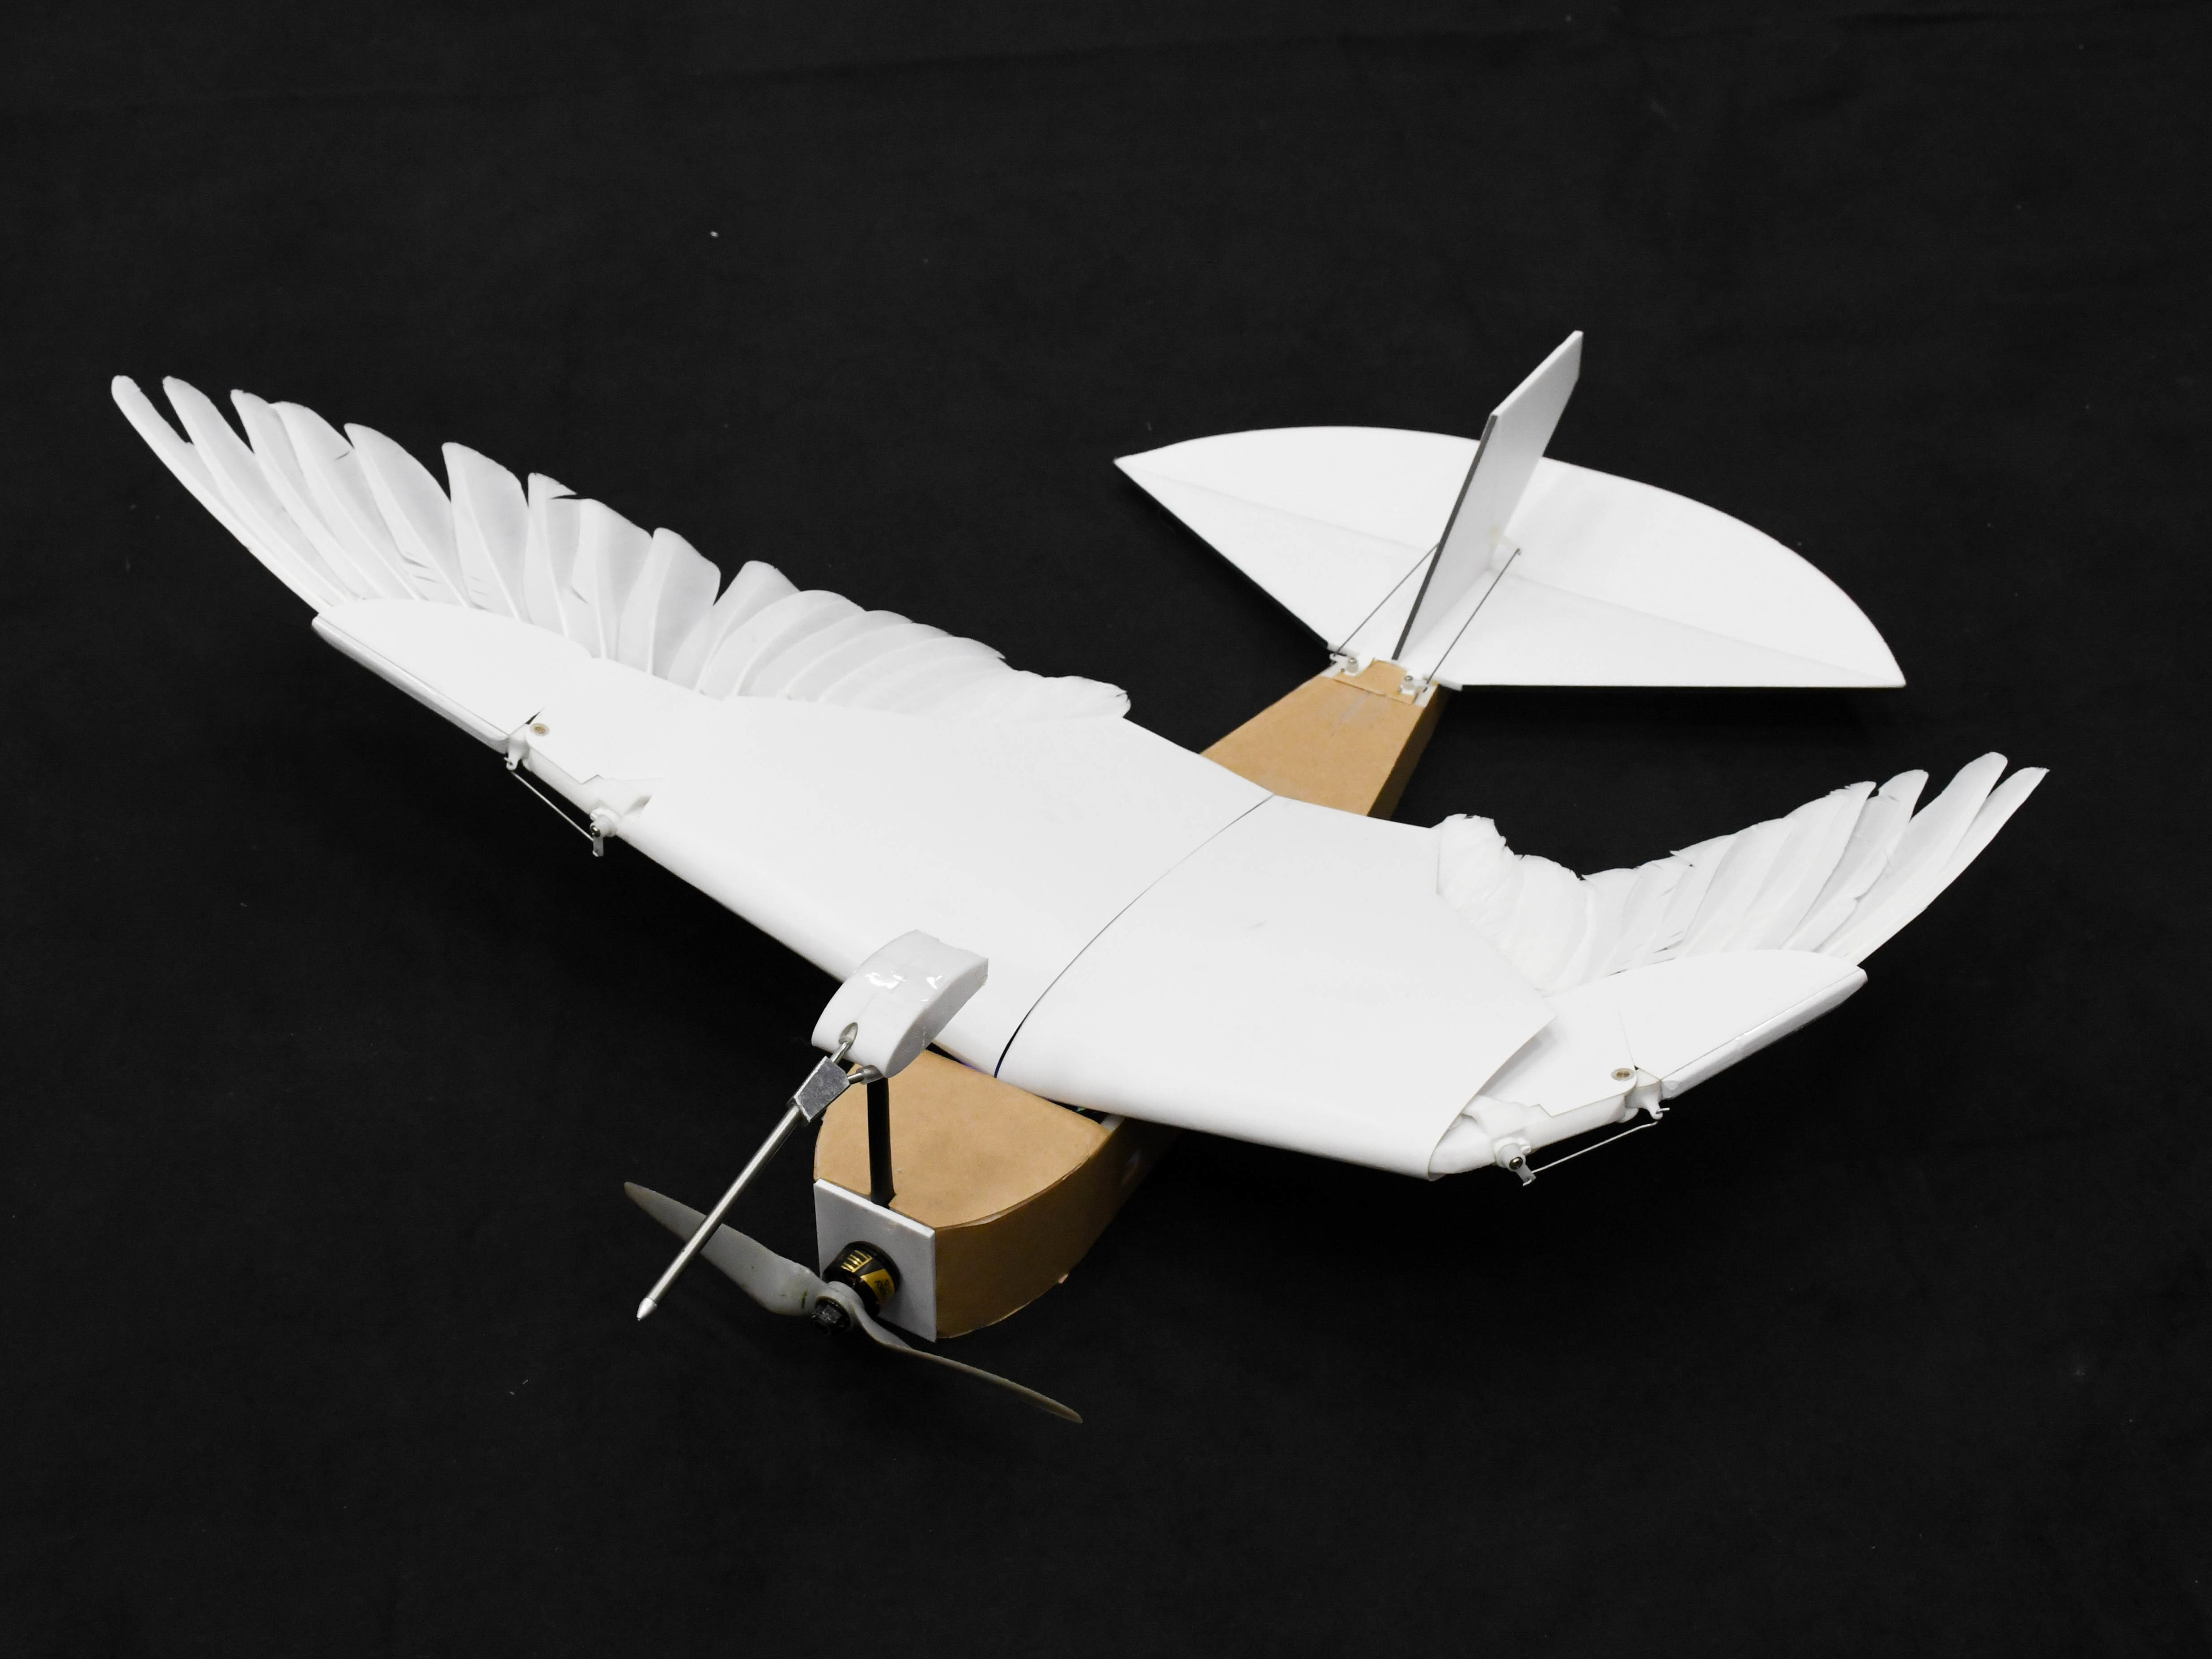 'PigeonBot' Brings Robots Closer To Birdlike Flight